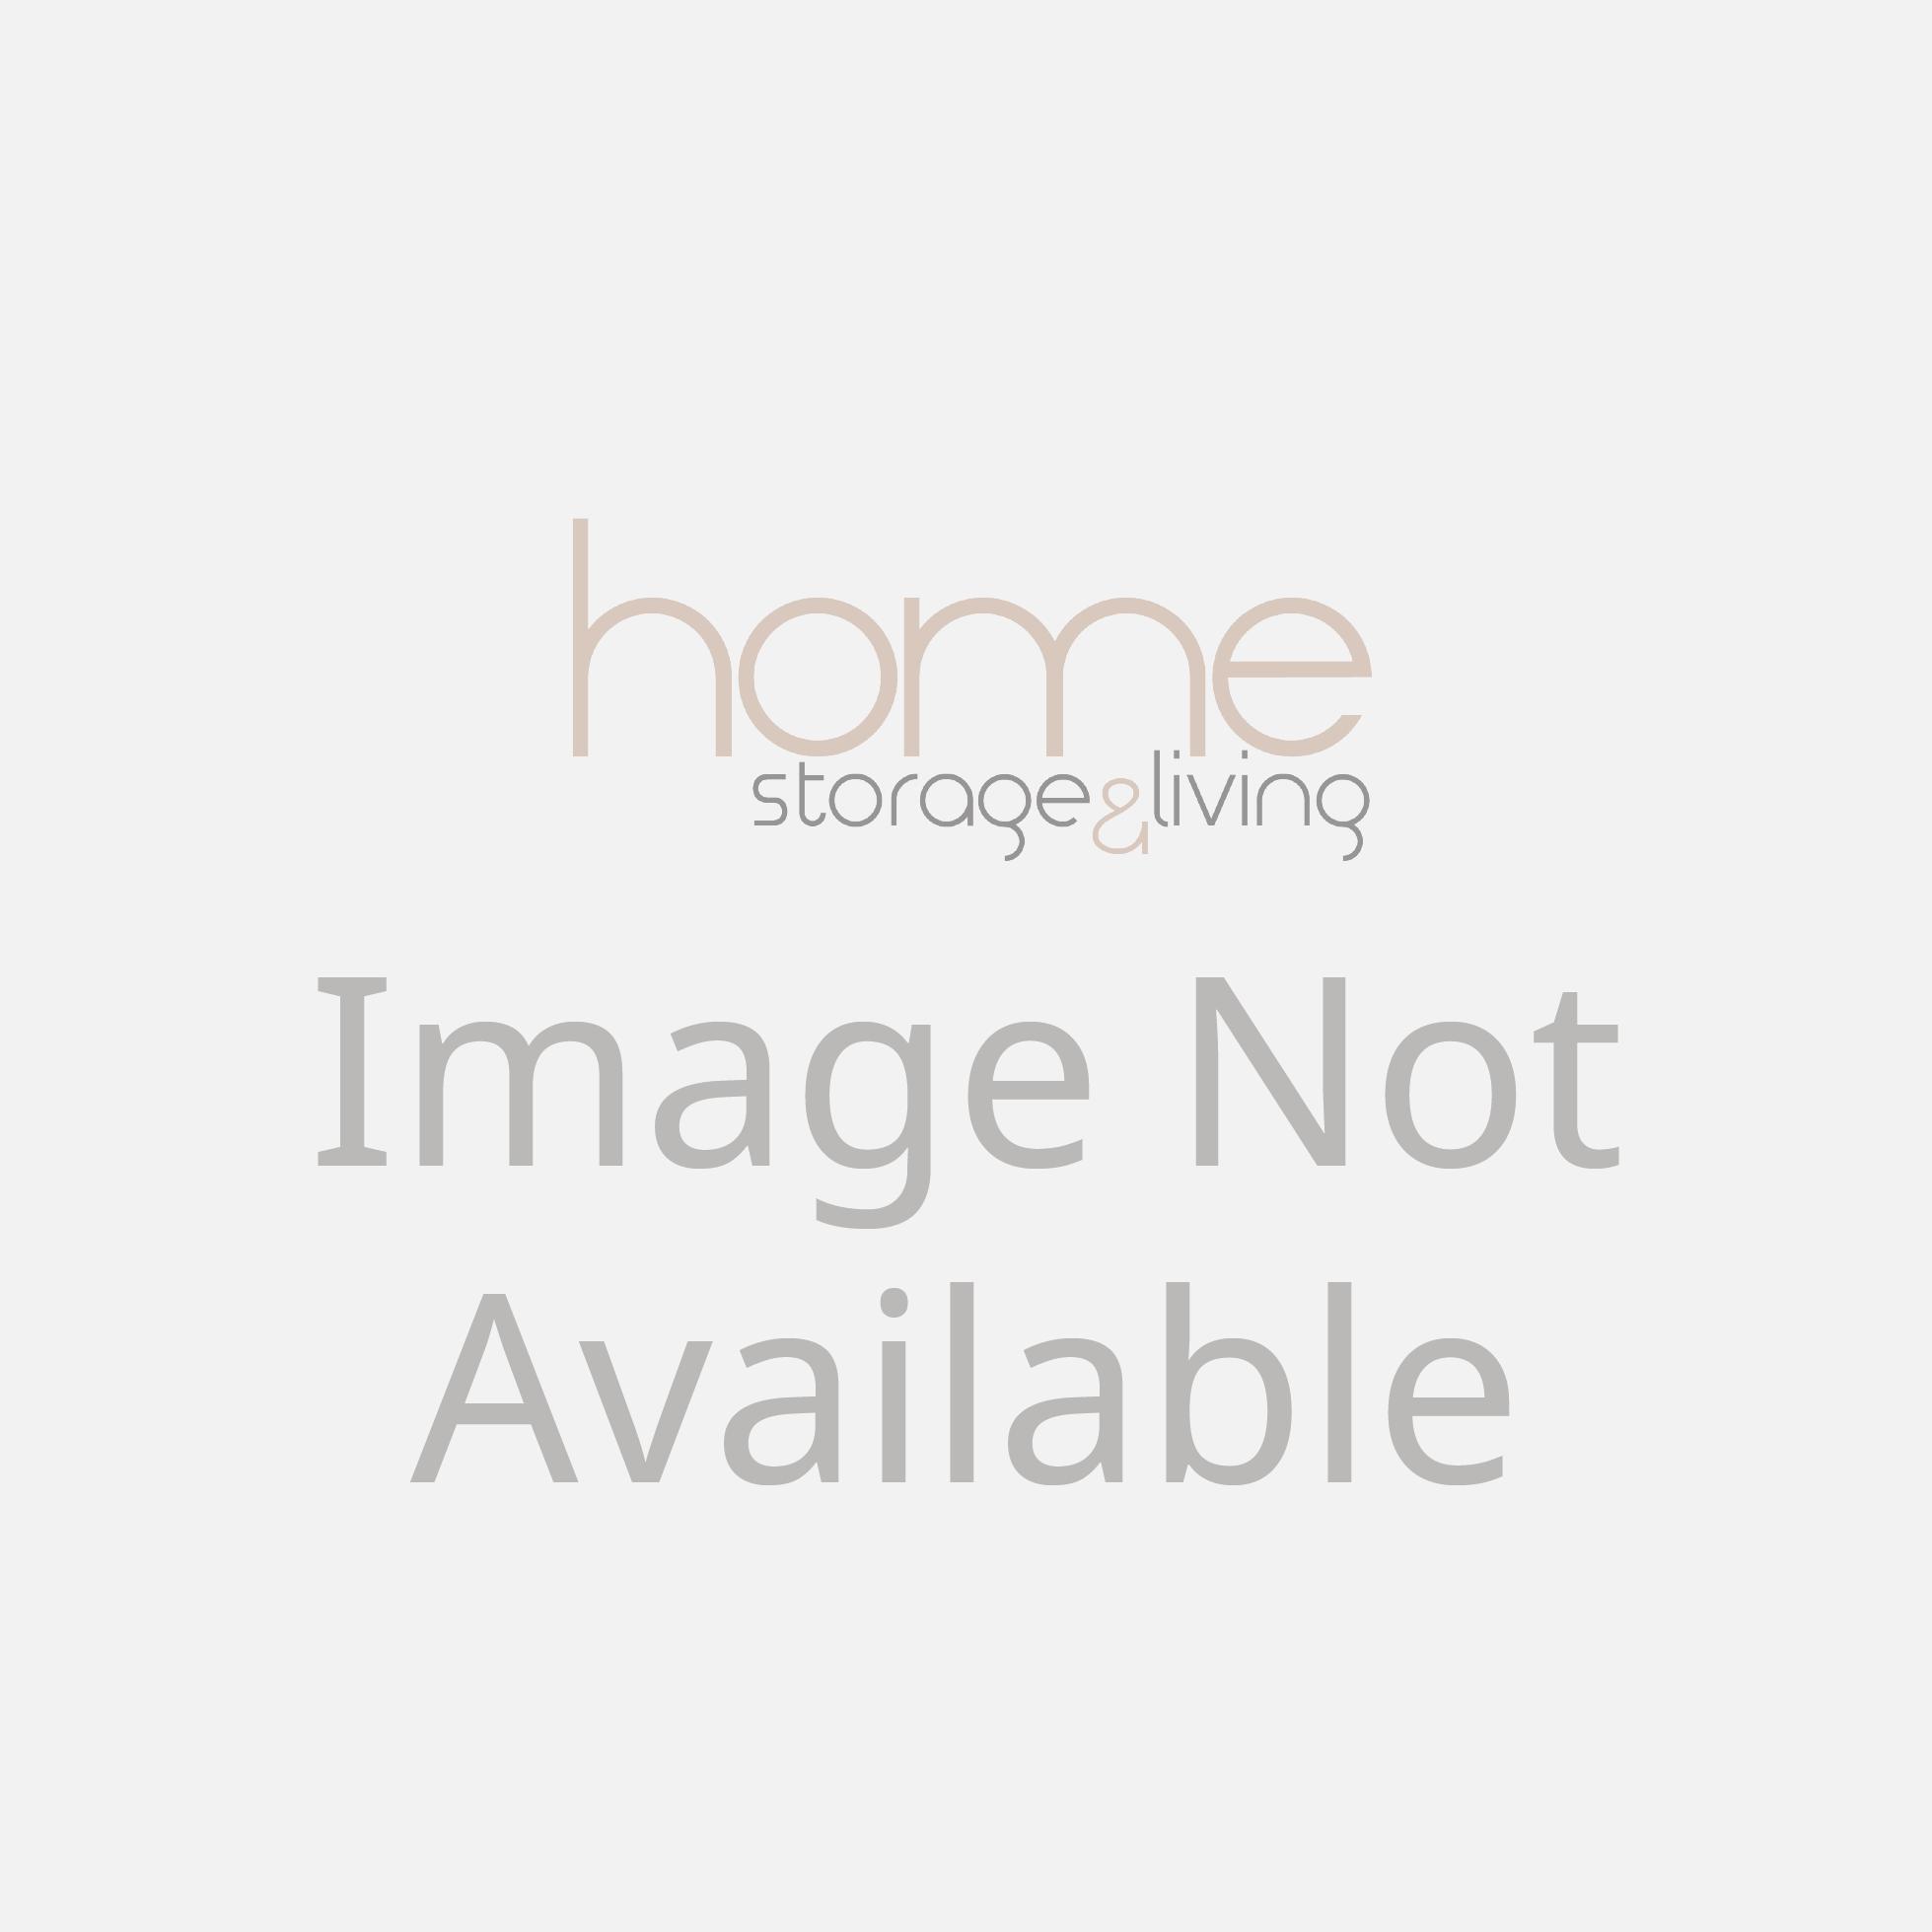 Kloset Soft Storage 6 Section Hanging Organiser Black 45 x 34 x 125cm | Home Storage & Living